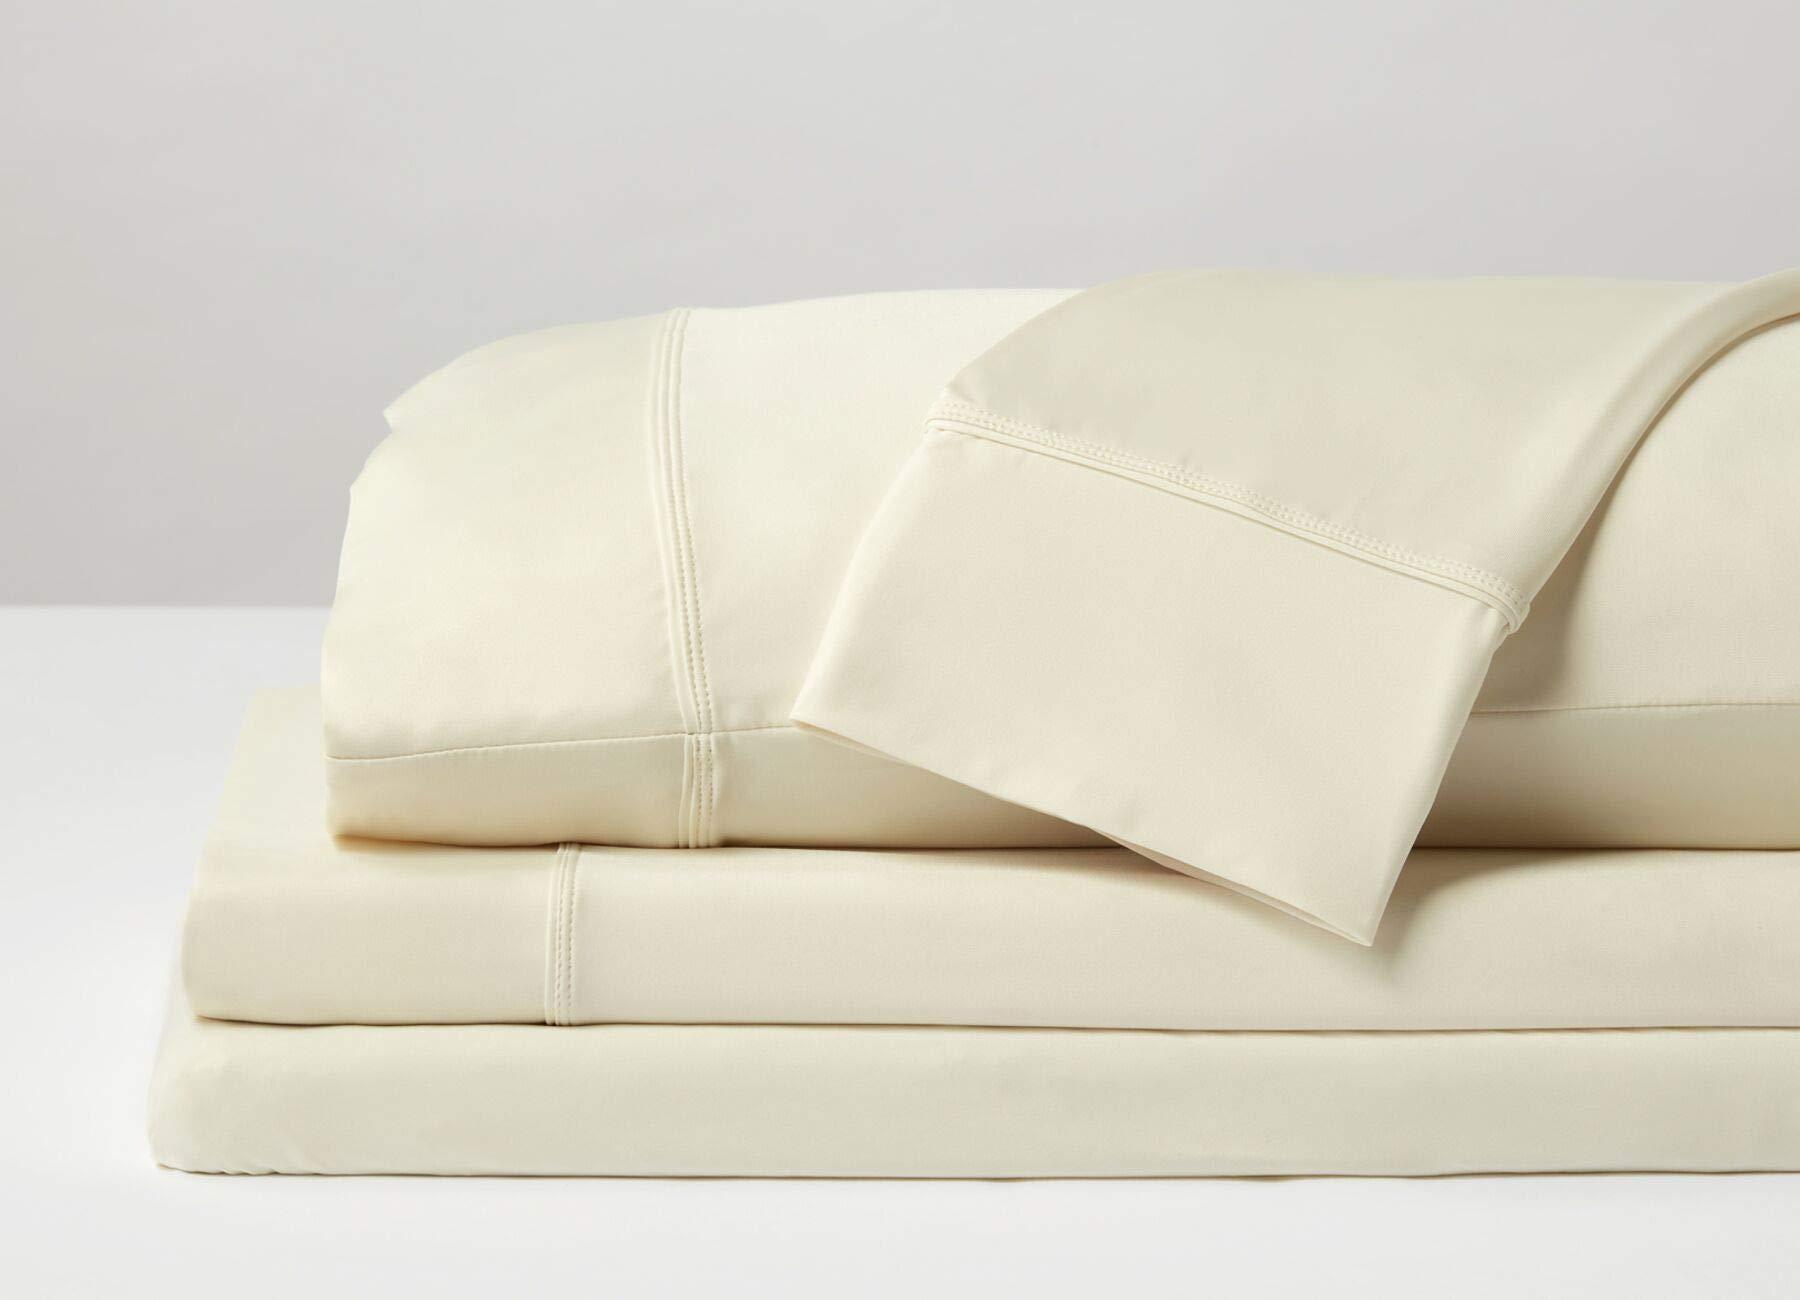 SHEEX - Original Performance Sheet Set with 1 Pillowcase, Ulta-Soft Fabric Transfers Heat and Breathes Better Than Traditional Cotton - Ecru, Twin/Twin XL